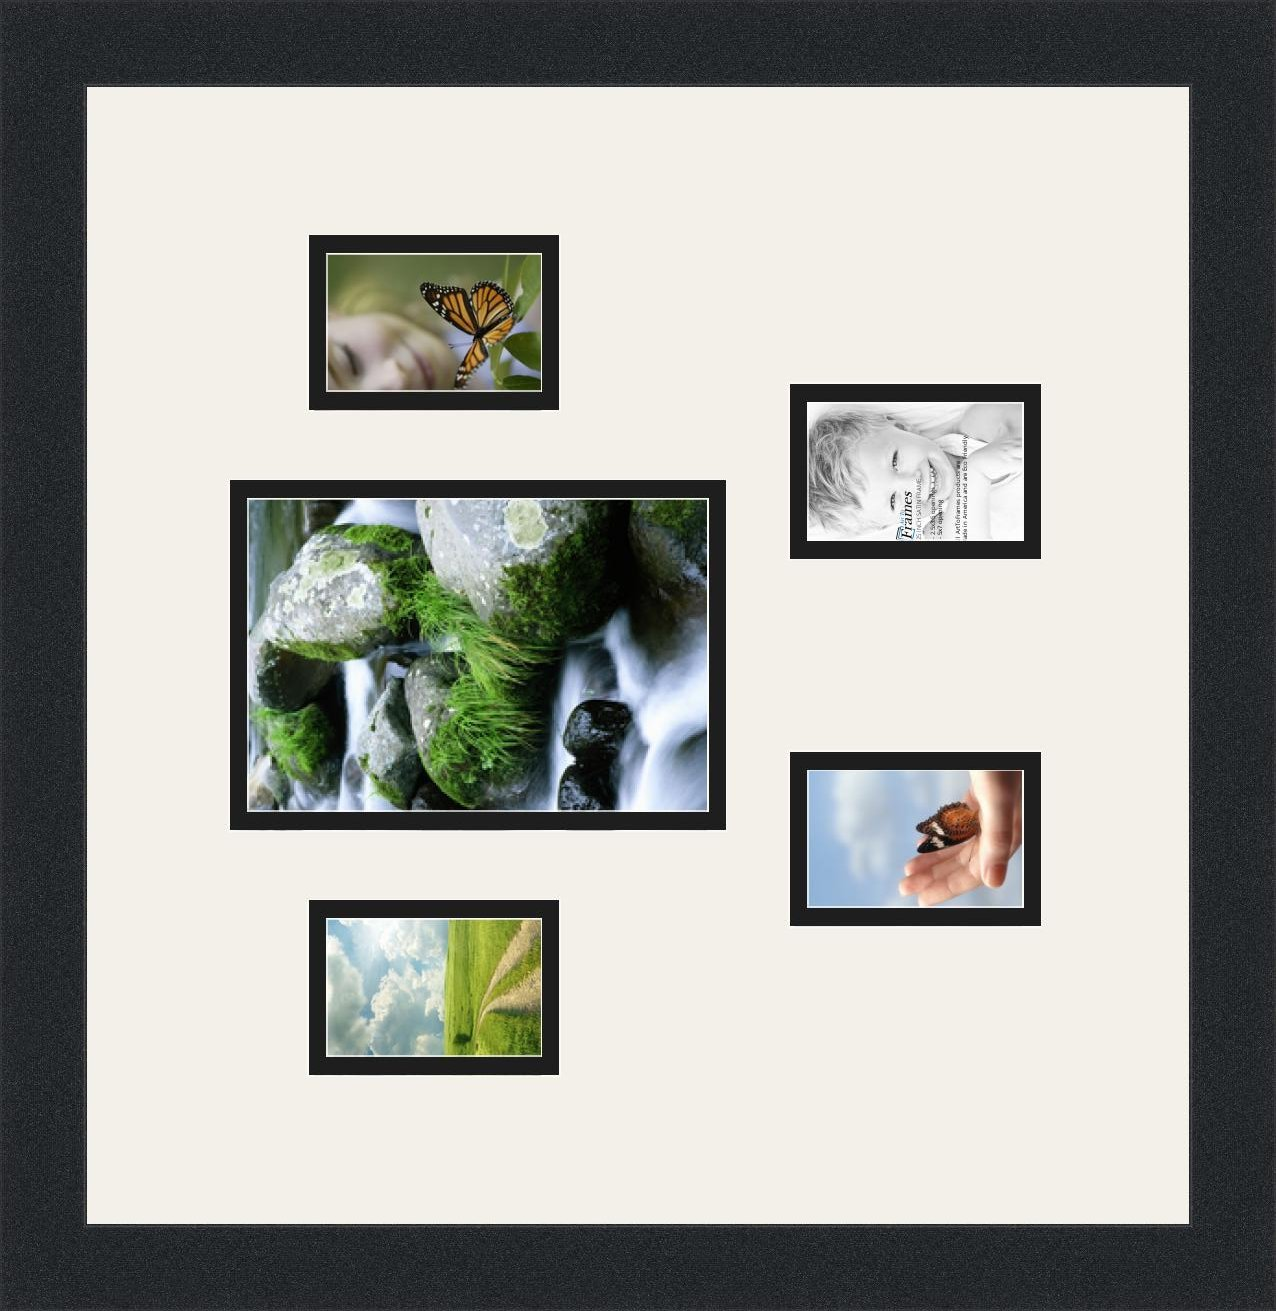 Beste 5x7 Rahmen Collage Fotos - Benutzerdefinierte Bilderrahmen ...